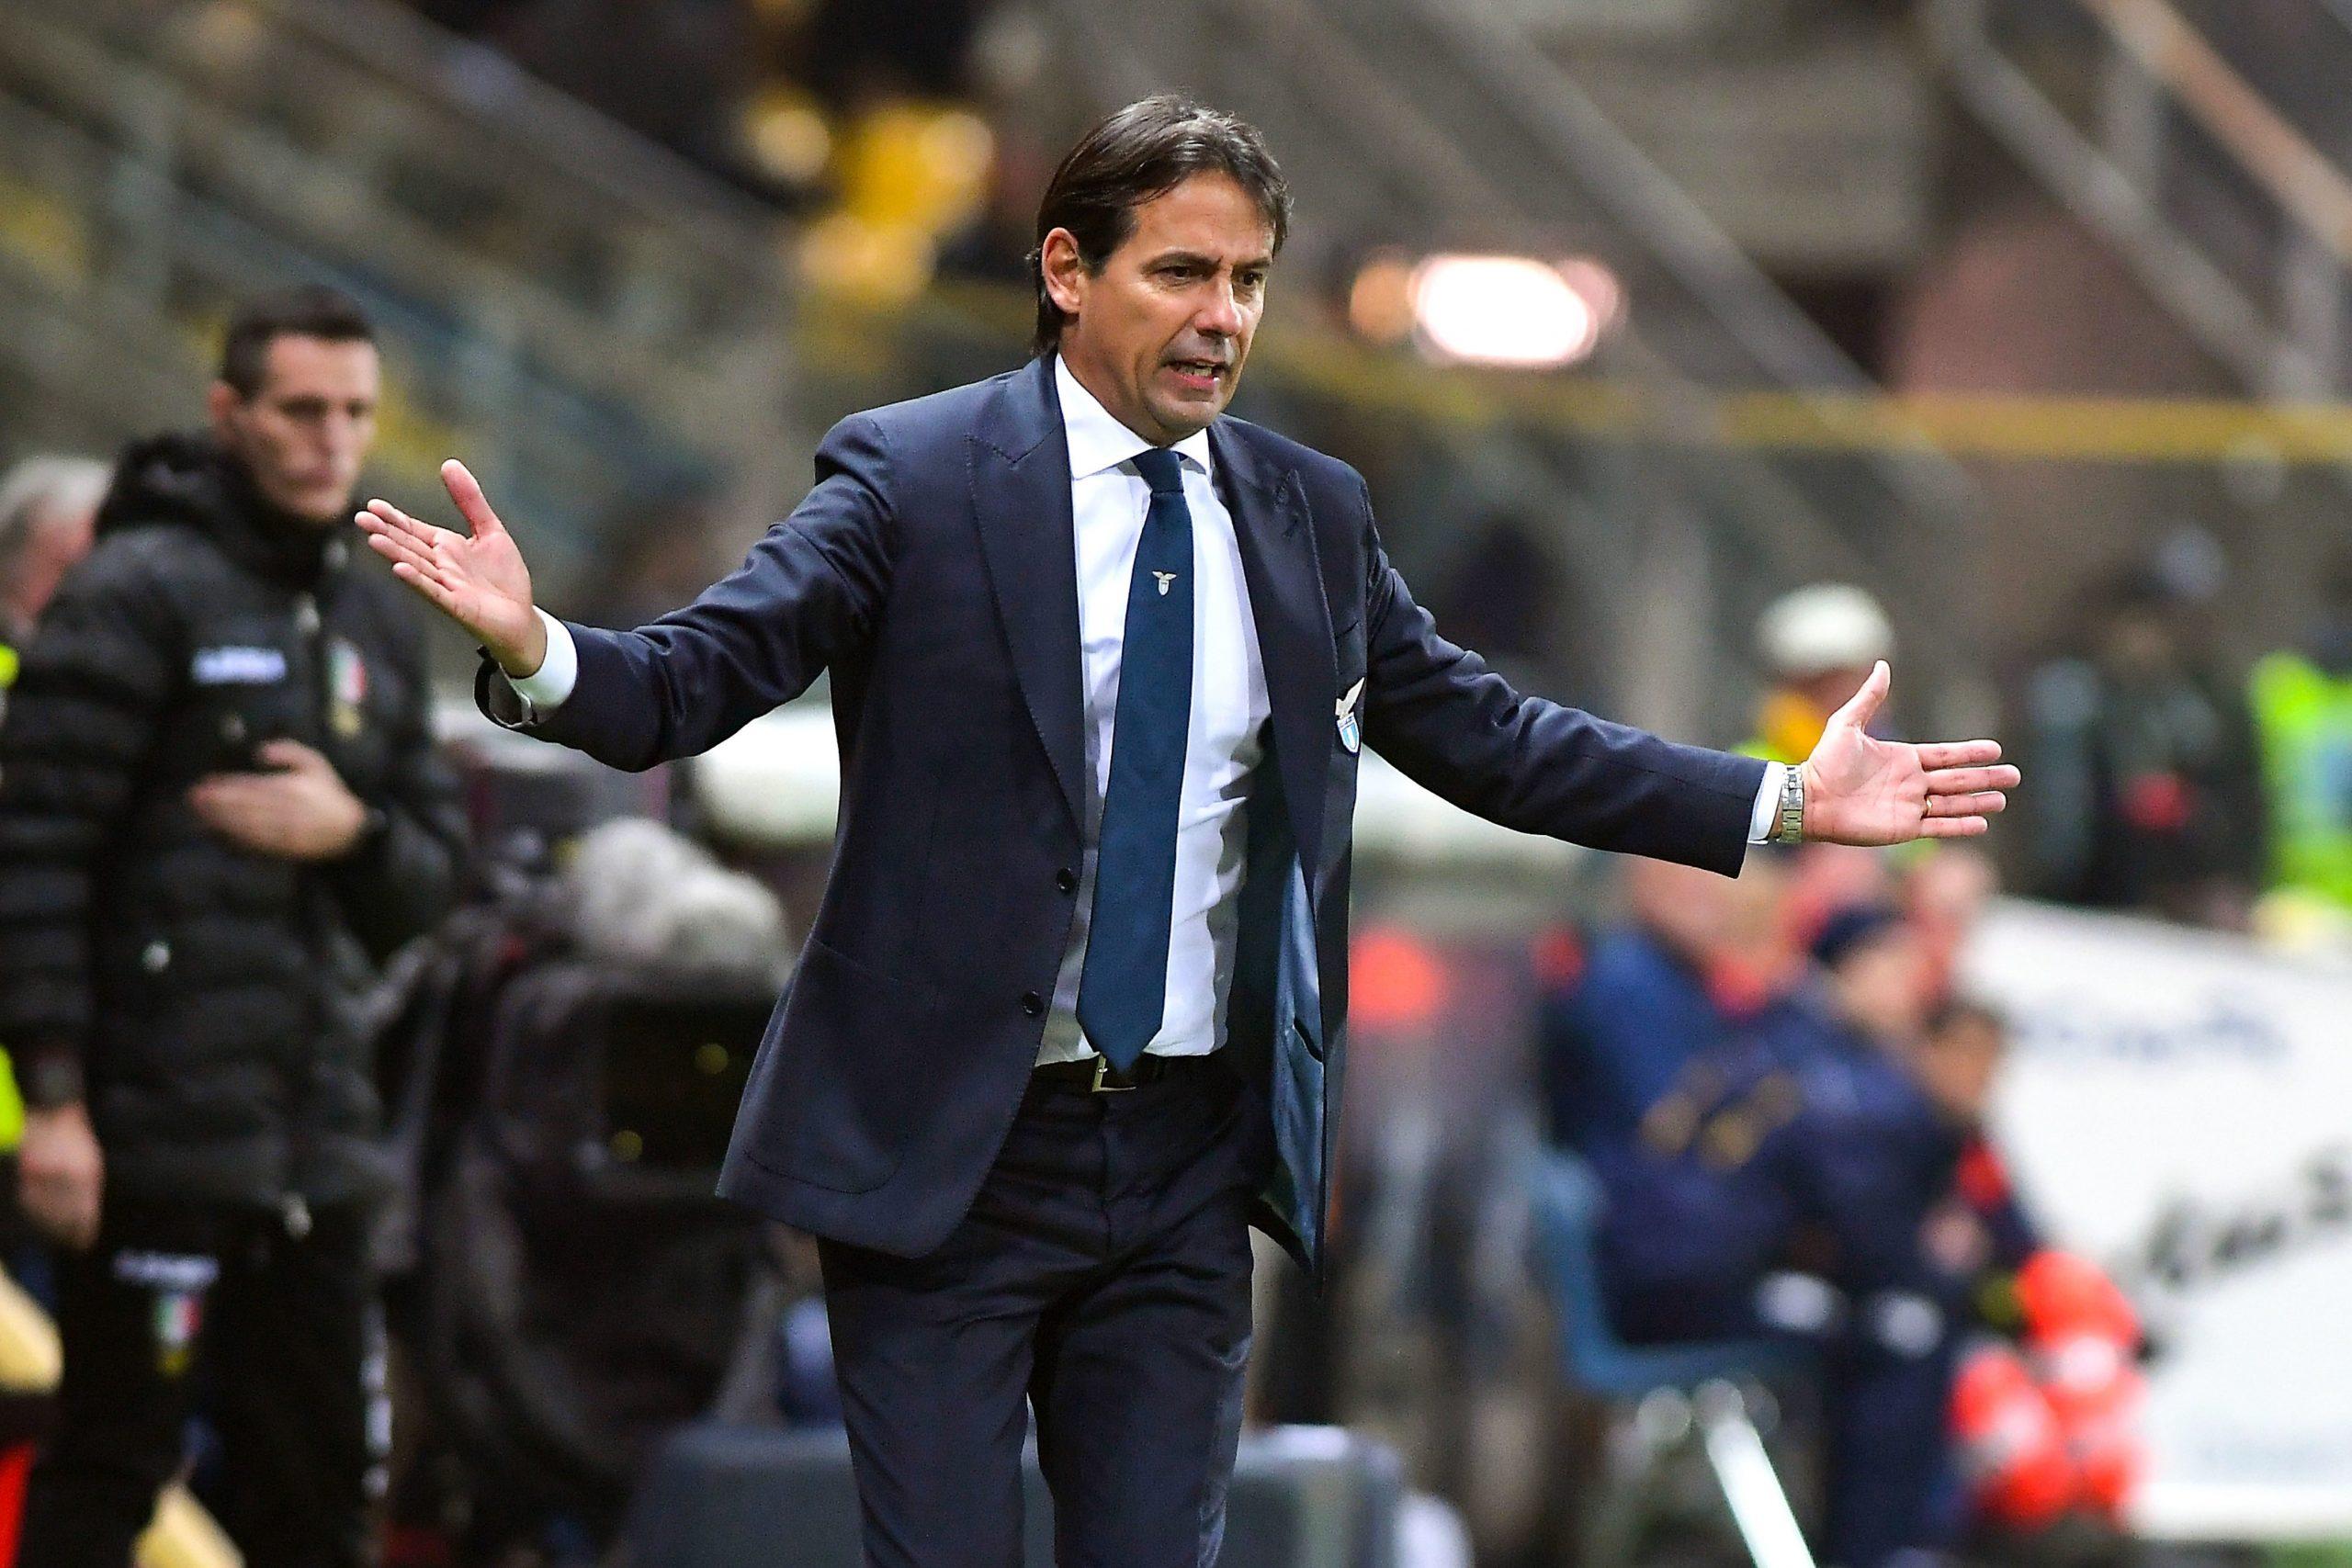 Mercato - Leonardo s'intéresse à Inzaghi, Milinkovic-Savic et Marusic, selon L'Equipe